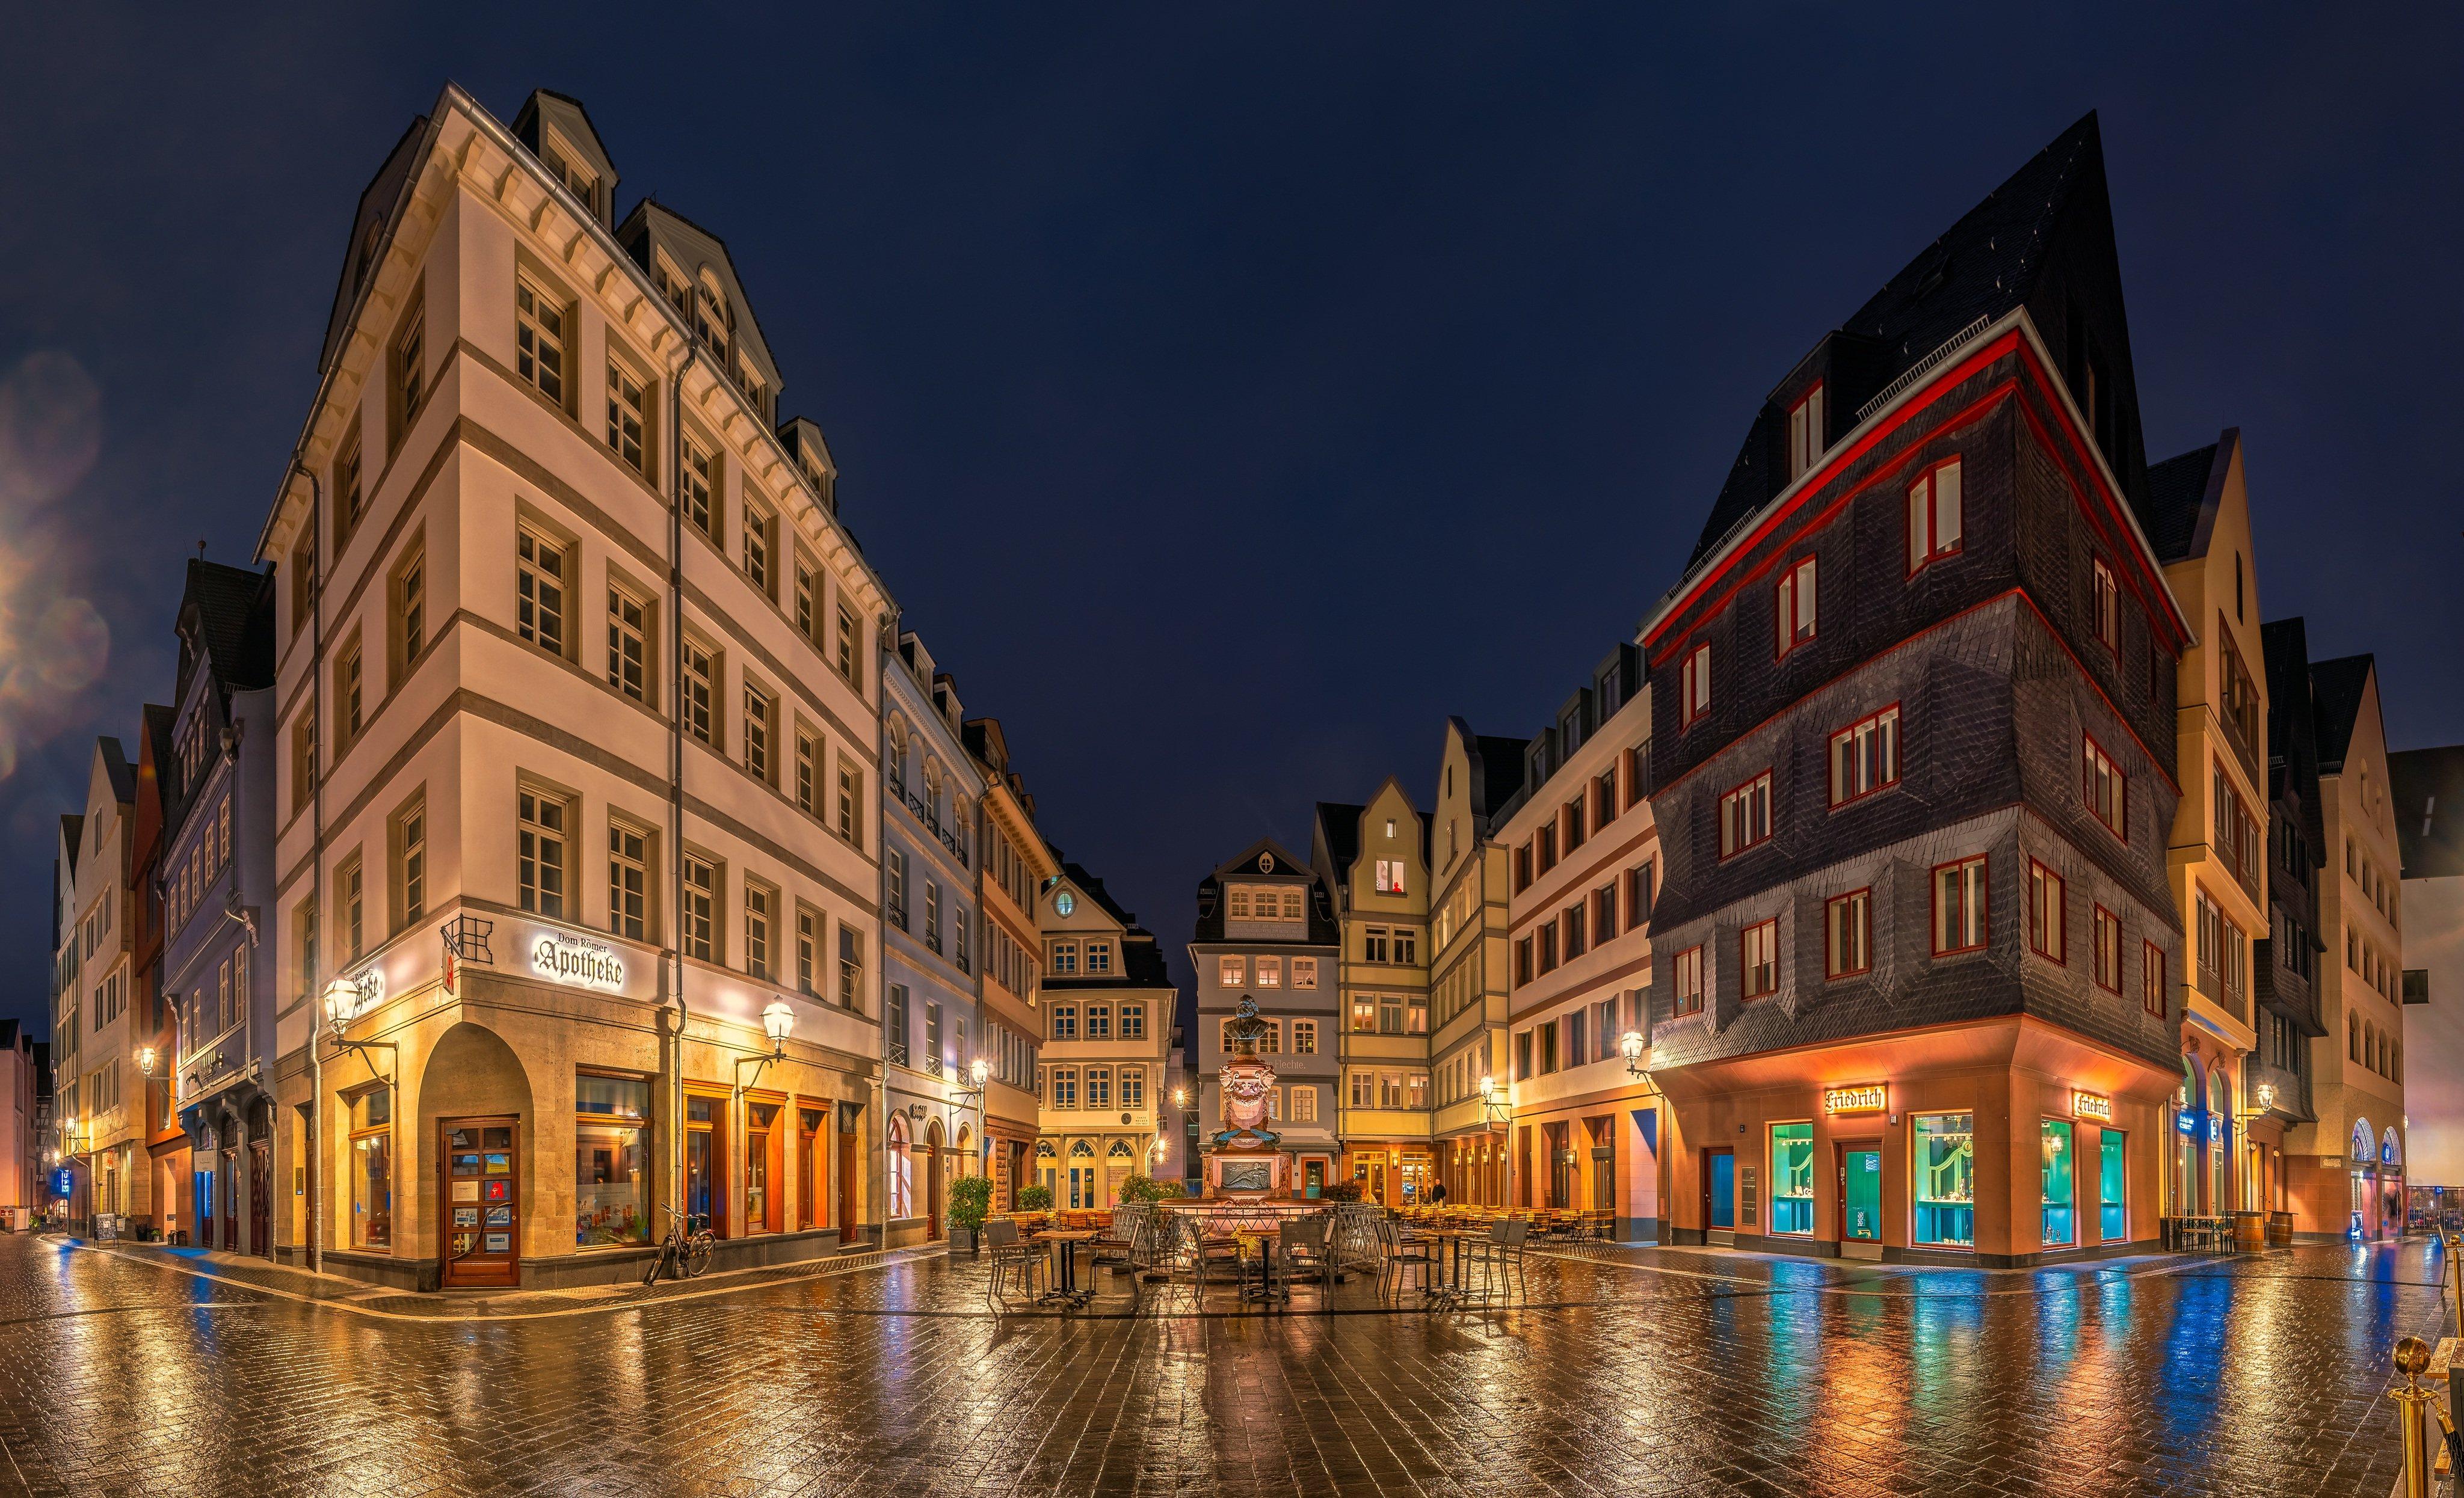 City Frankfurt Germany Light Night 4096x2491